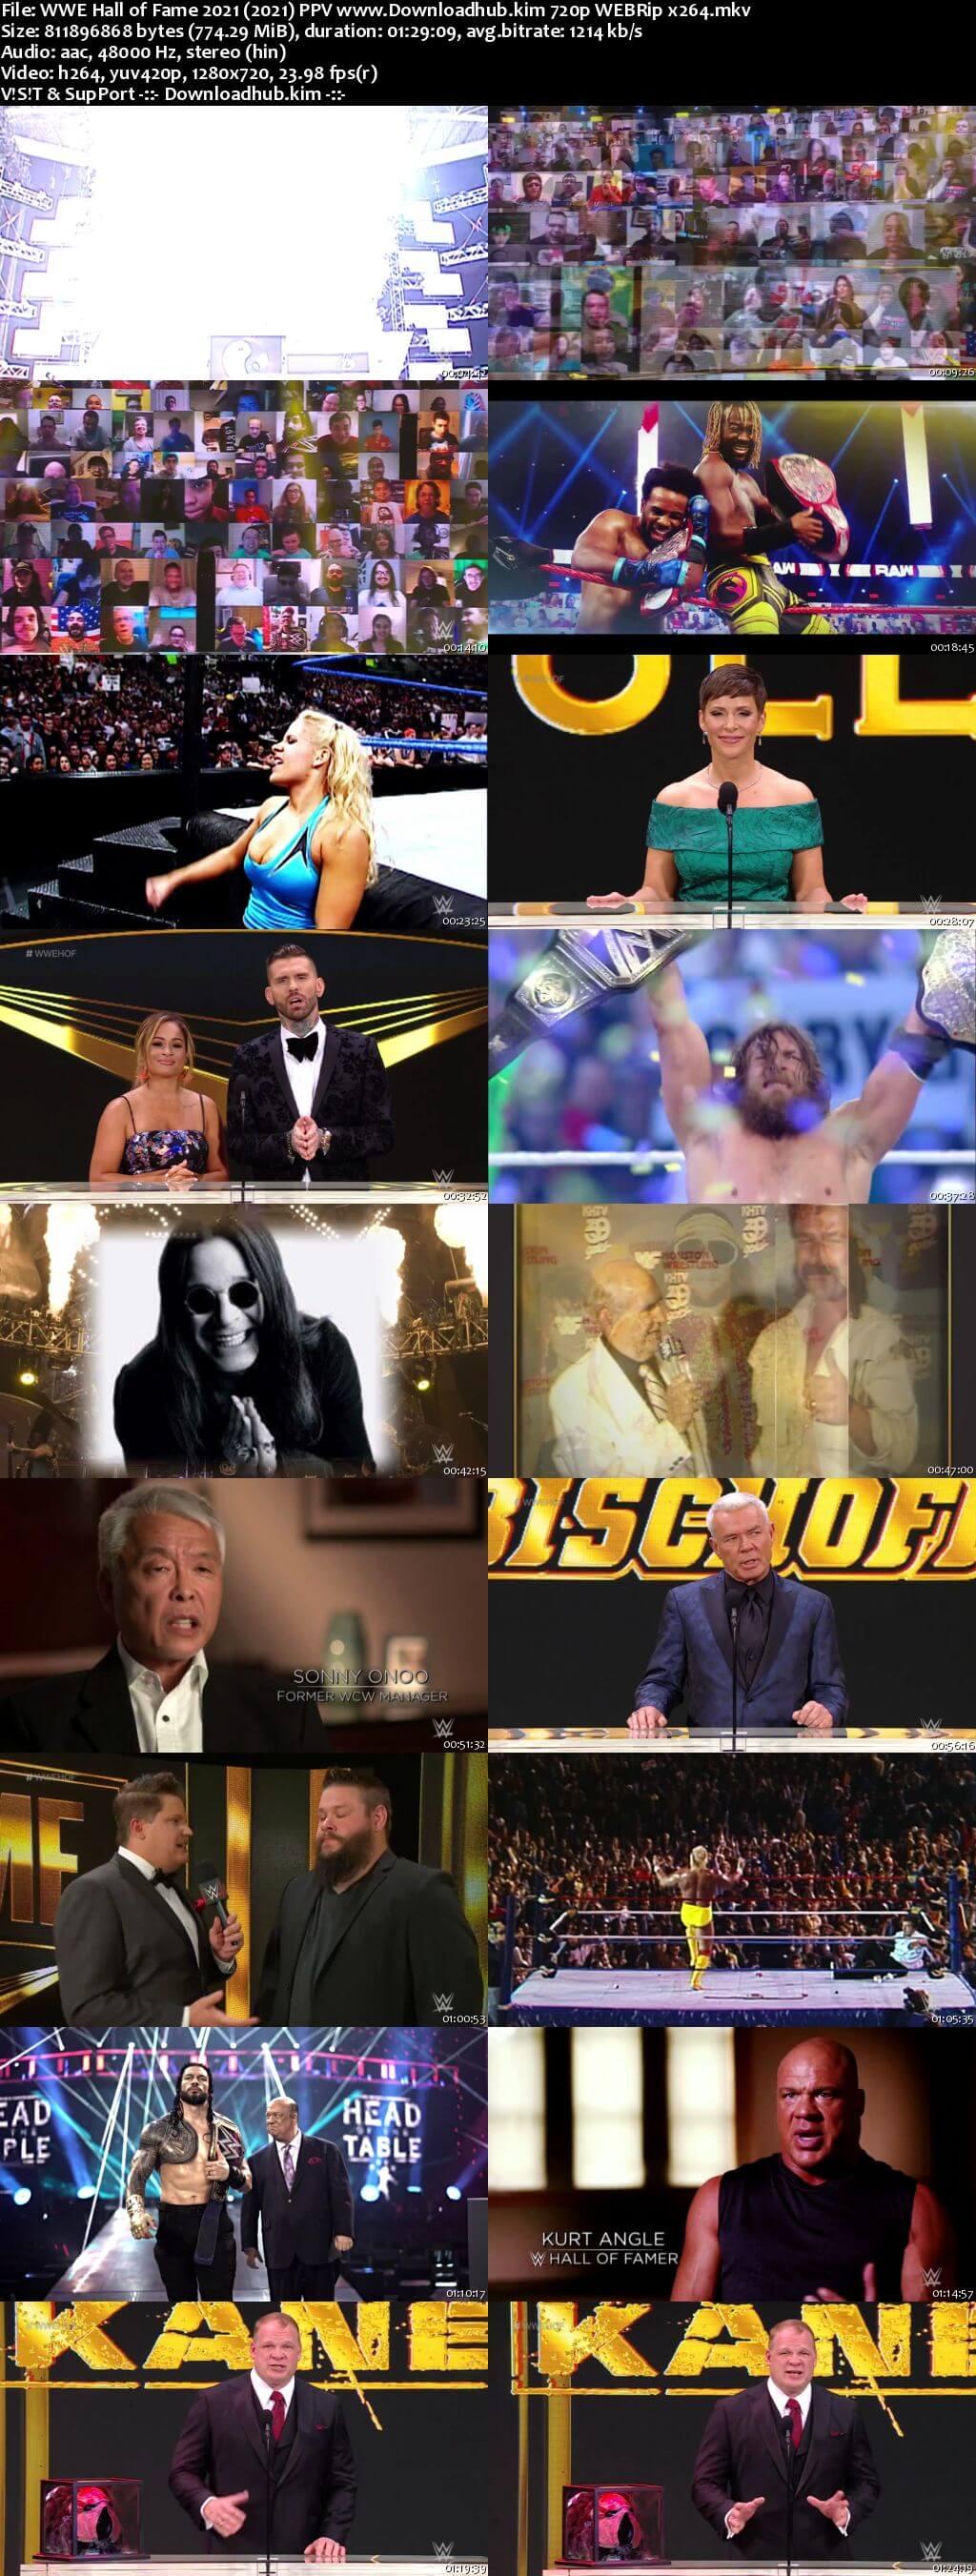 WWE Hall of Fame 6th April 2021 720p 350MB WEBRip 480p